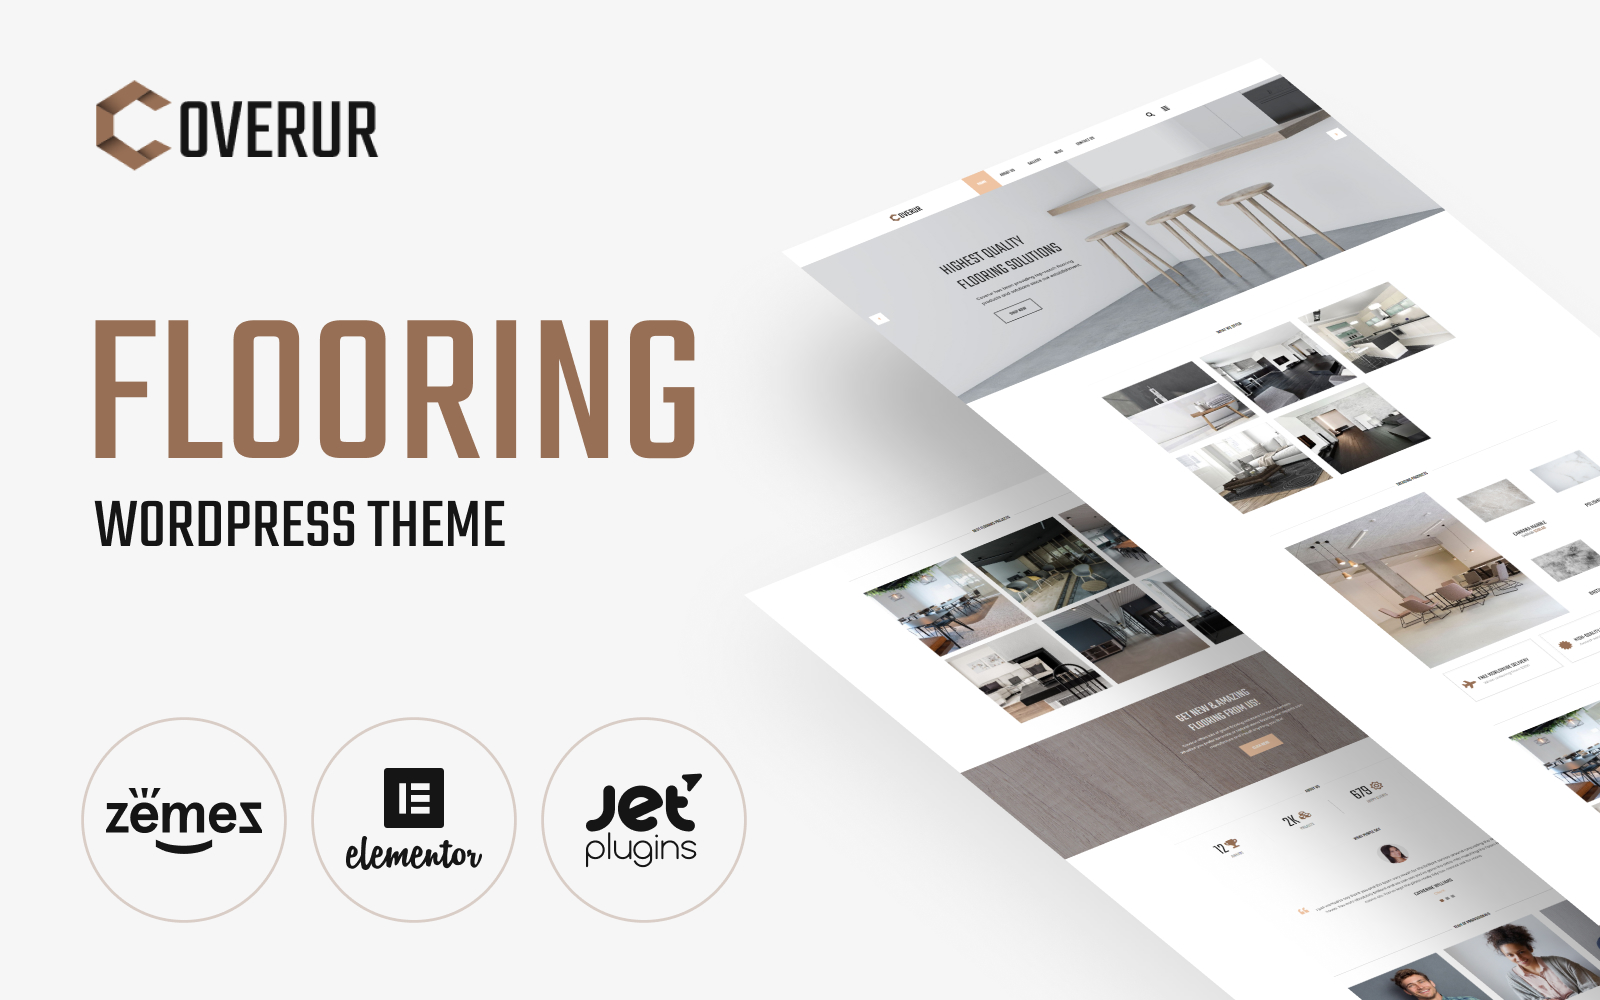 Coverur - Flooring Company Multipurpose Minimal Elementor Tema WordPress №81169